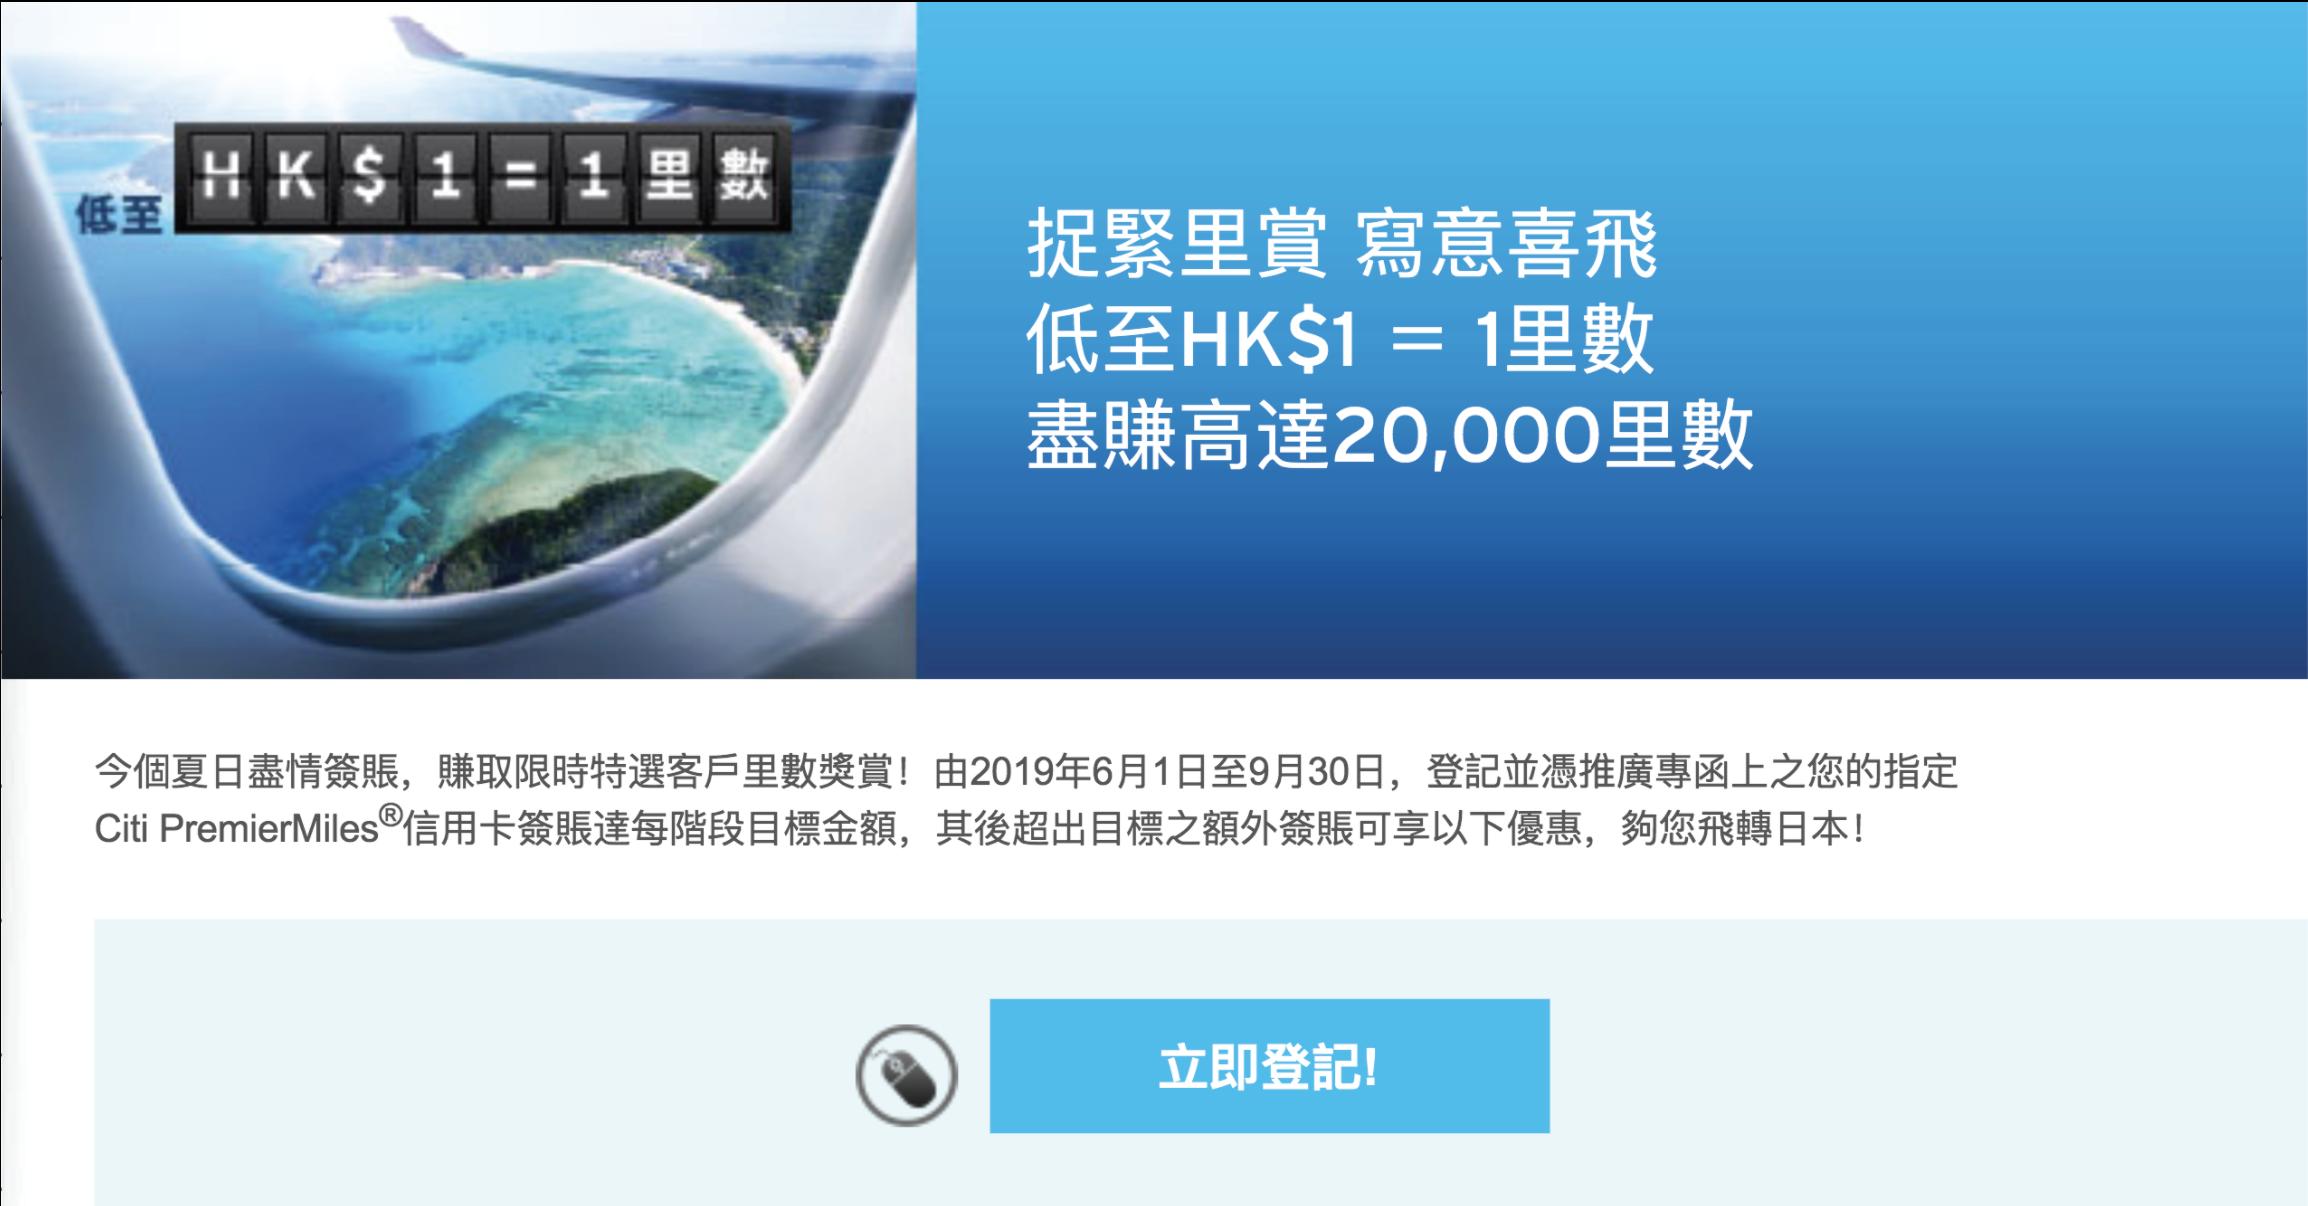 Citi信用卡特選客戶offer!捉緊里賞,寫意喜飛!低至HK$1 = 1里數!盡賺高達20,000里數!Payme都計啊!